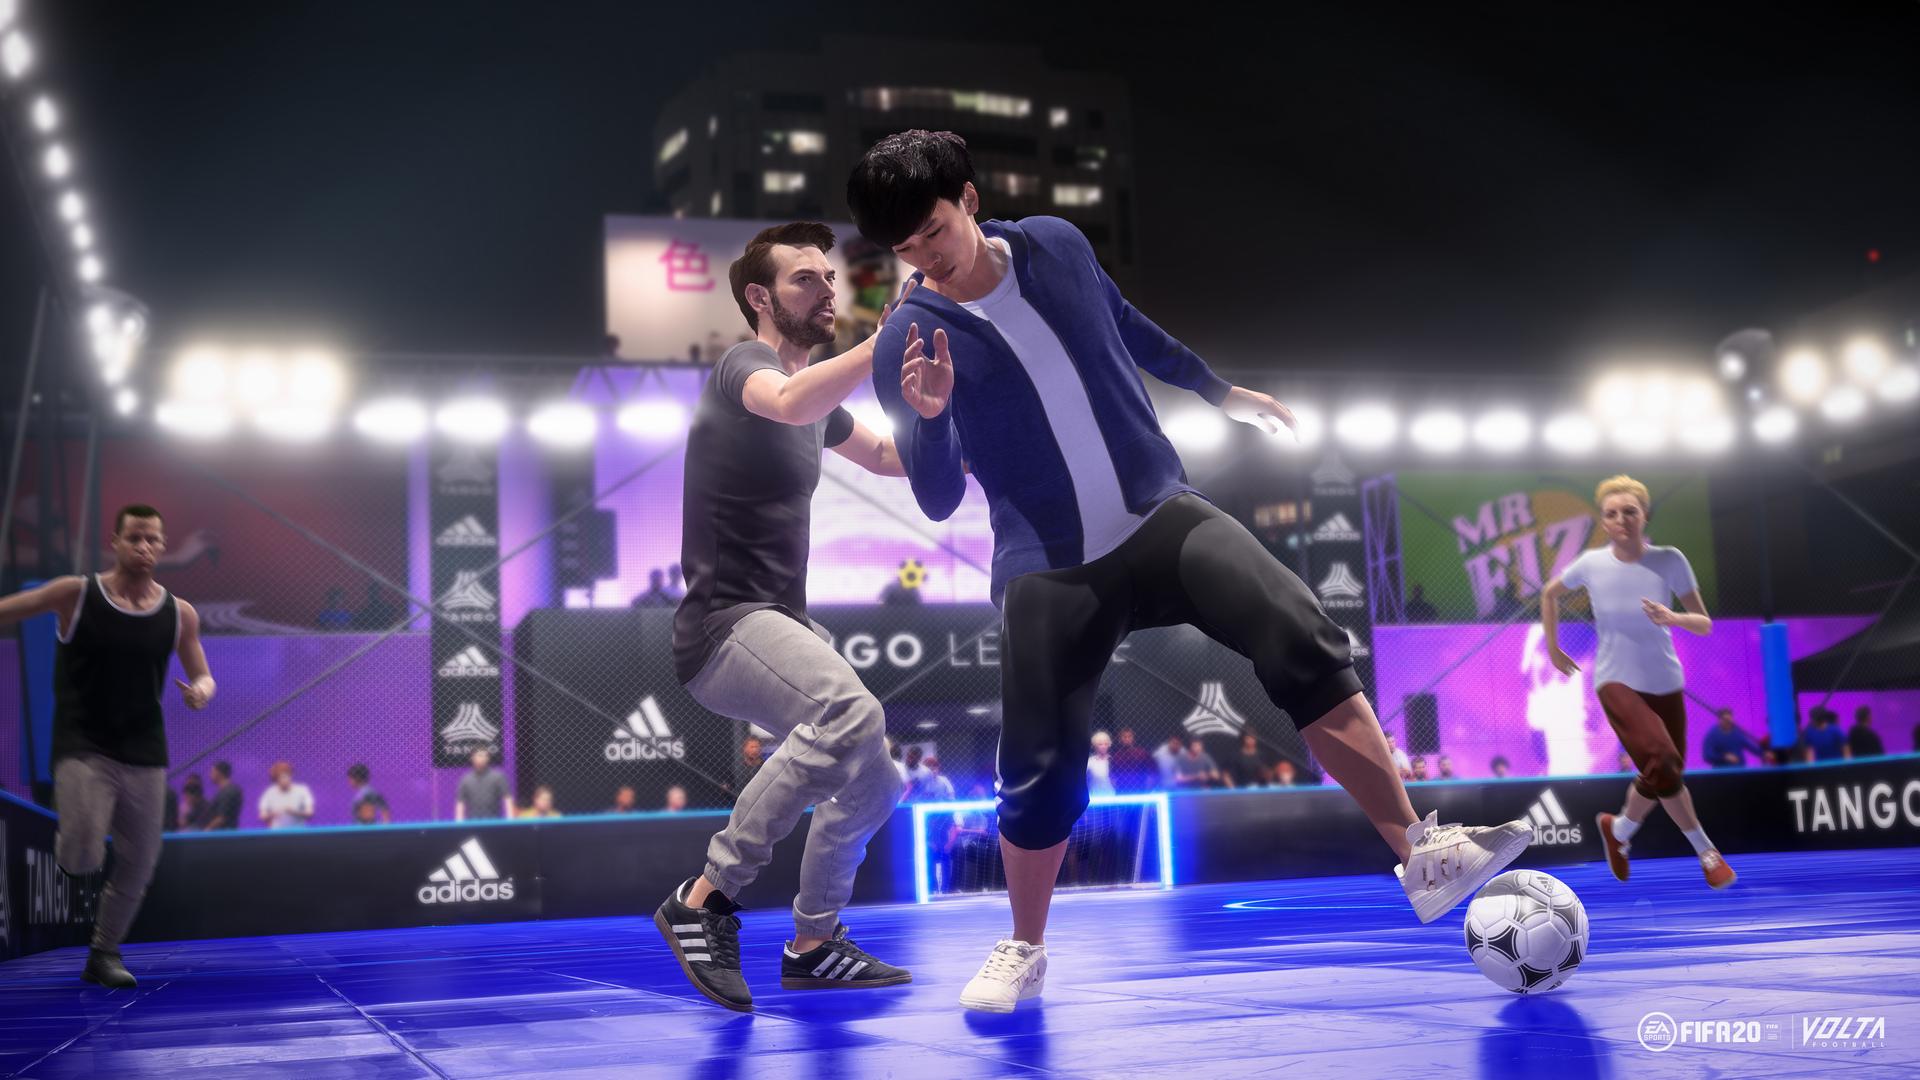 E3:《FIFA 20》首批截图 妹子带球戏耍帅哥